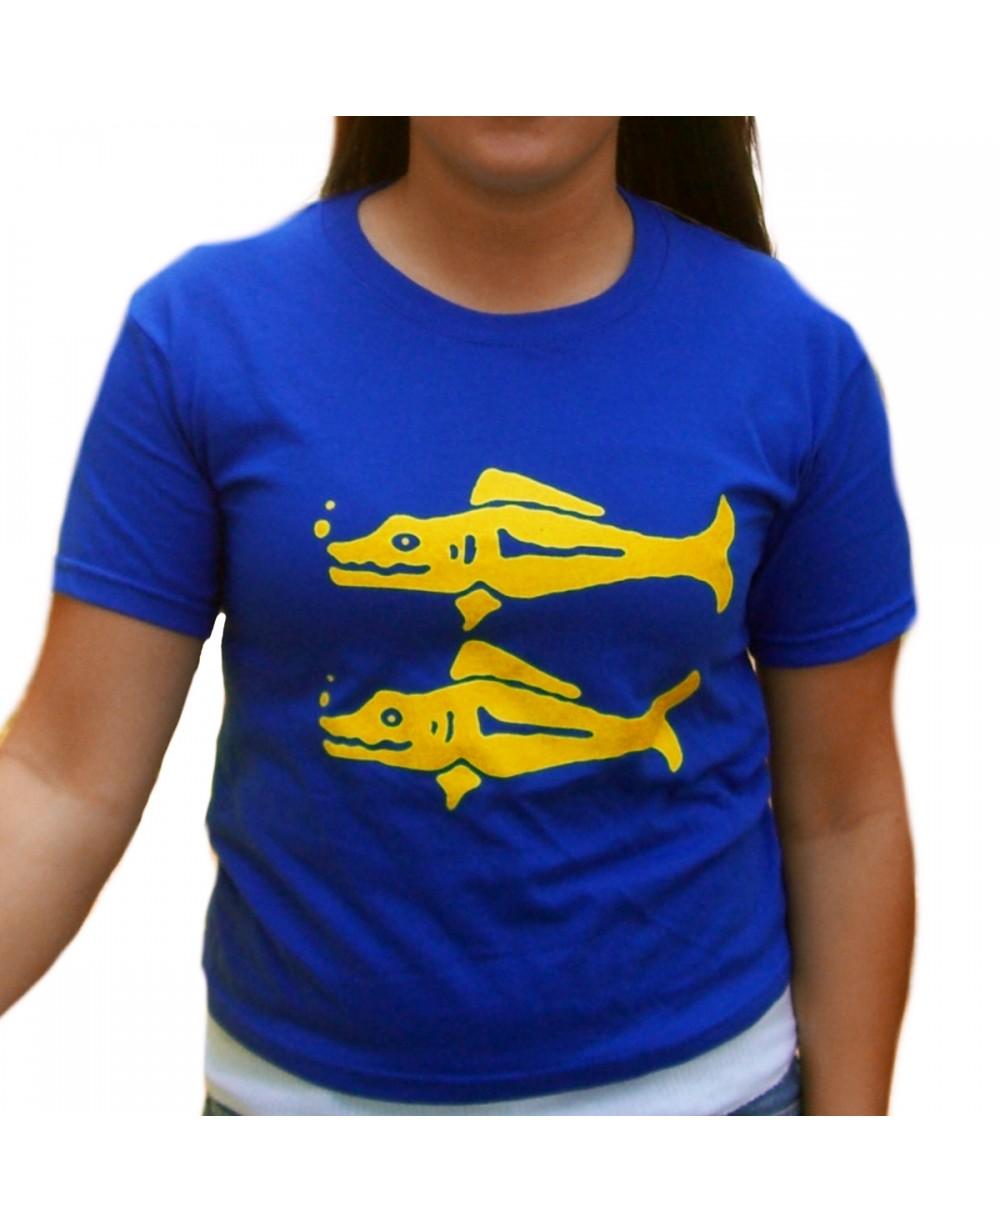 Blue Barracudas Team Costume  Outfit Costume Royal Blue Basic Men/'s T-Shirt